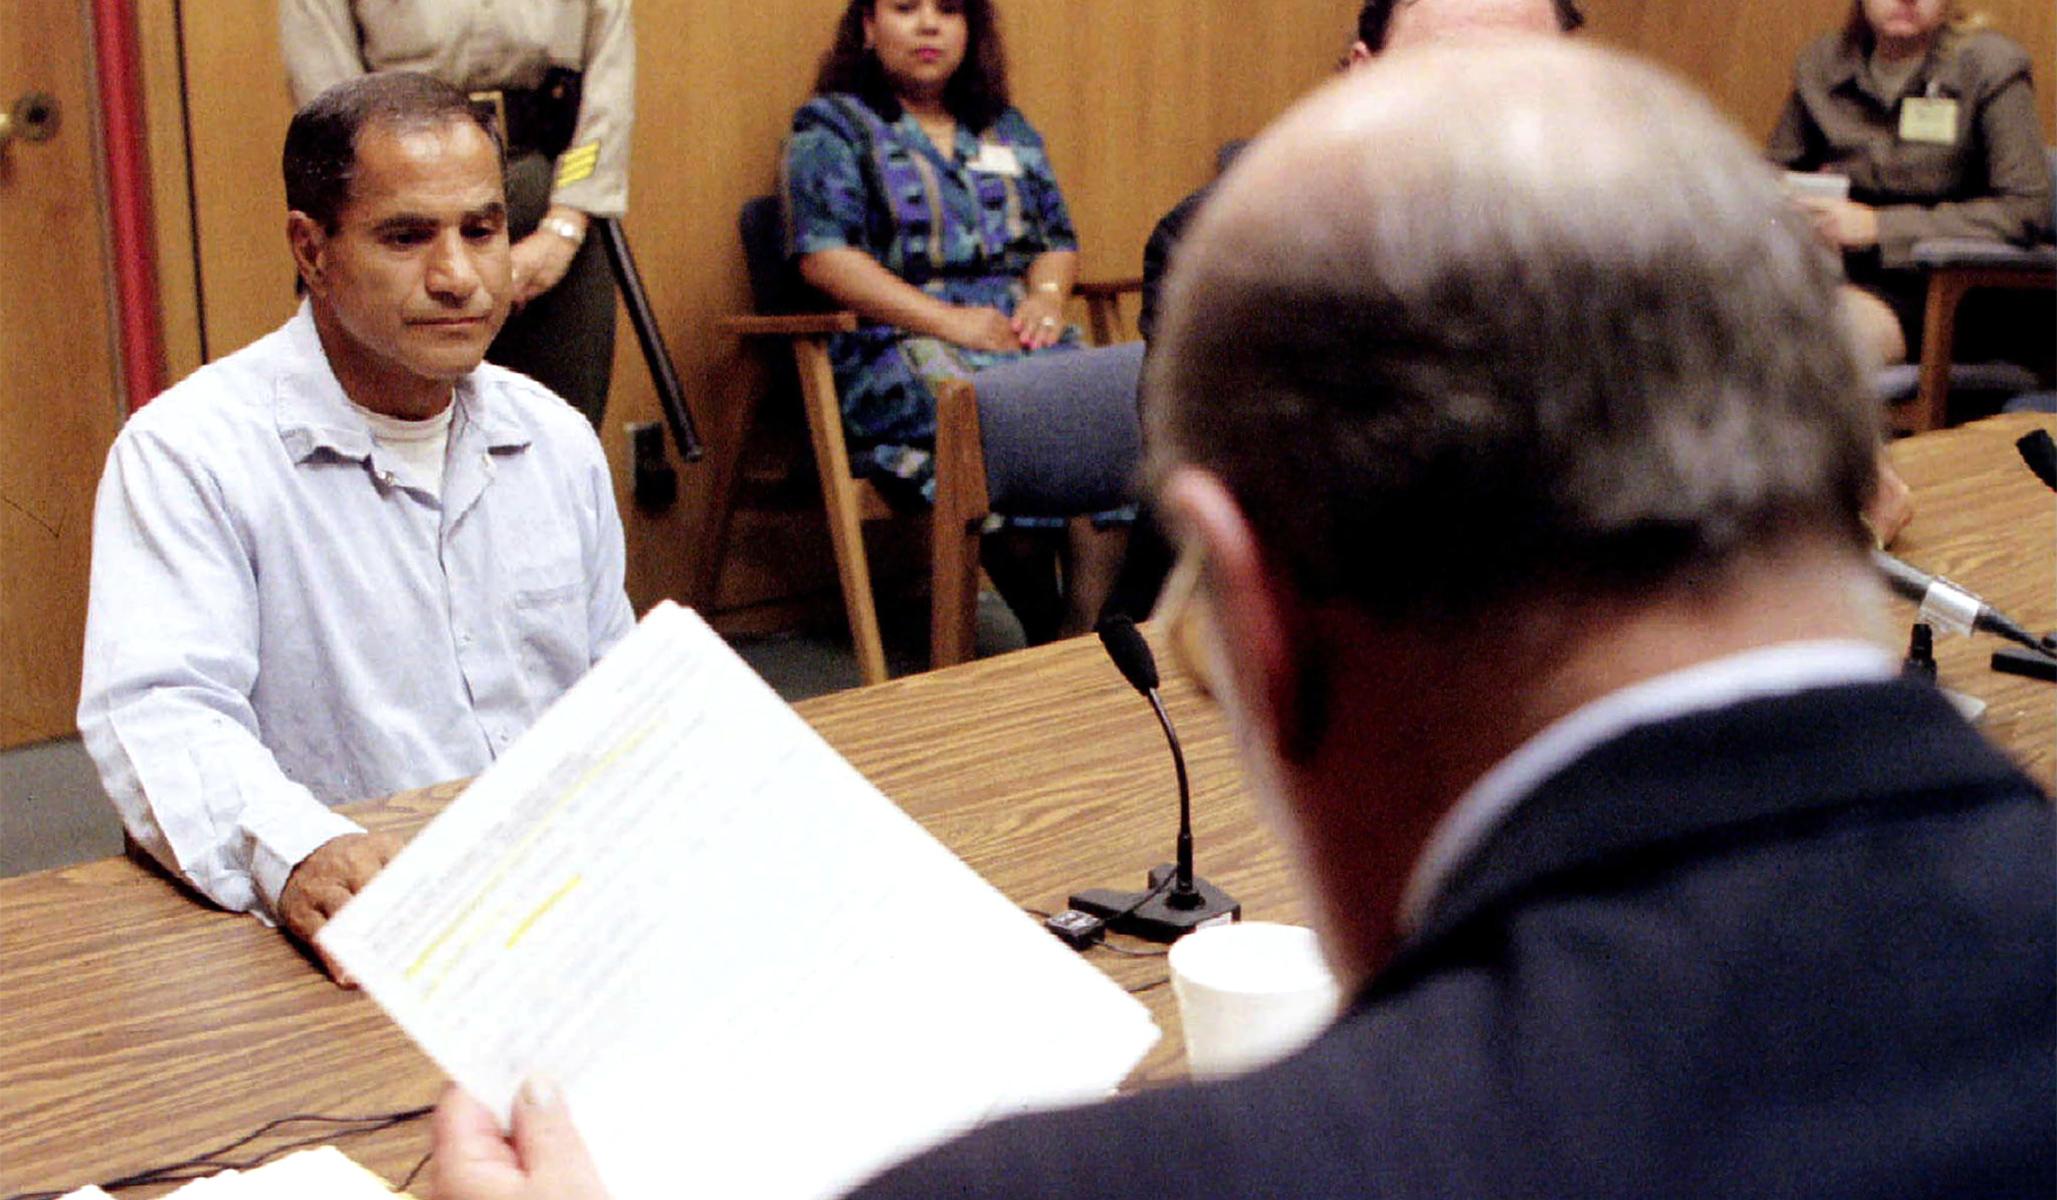 sirhan sirhan probation hearing